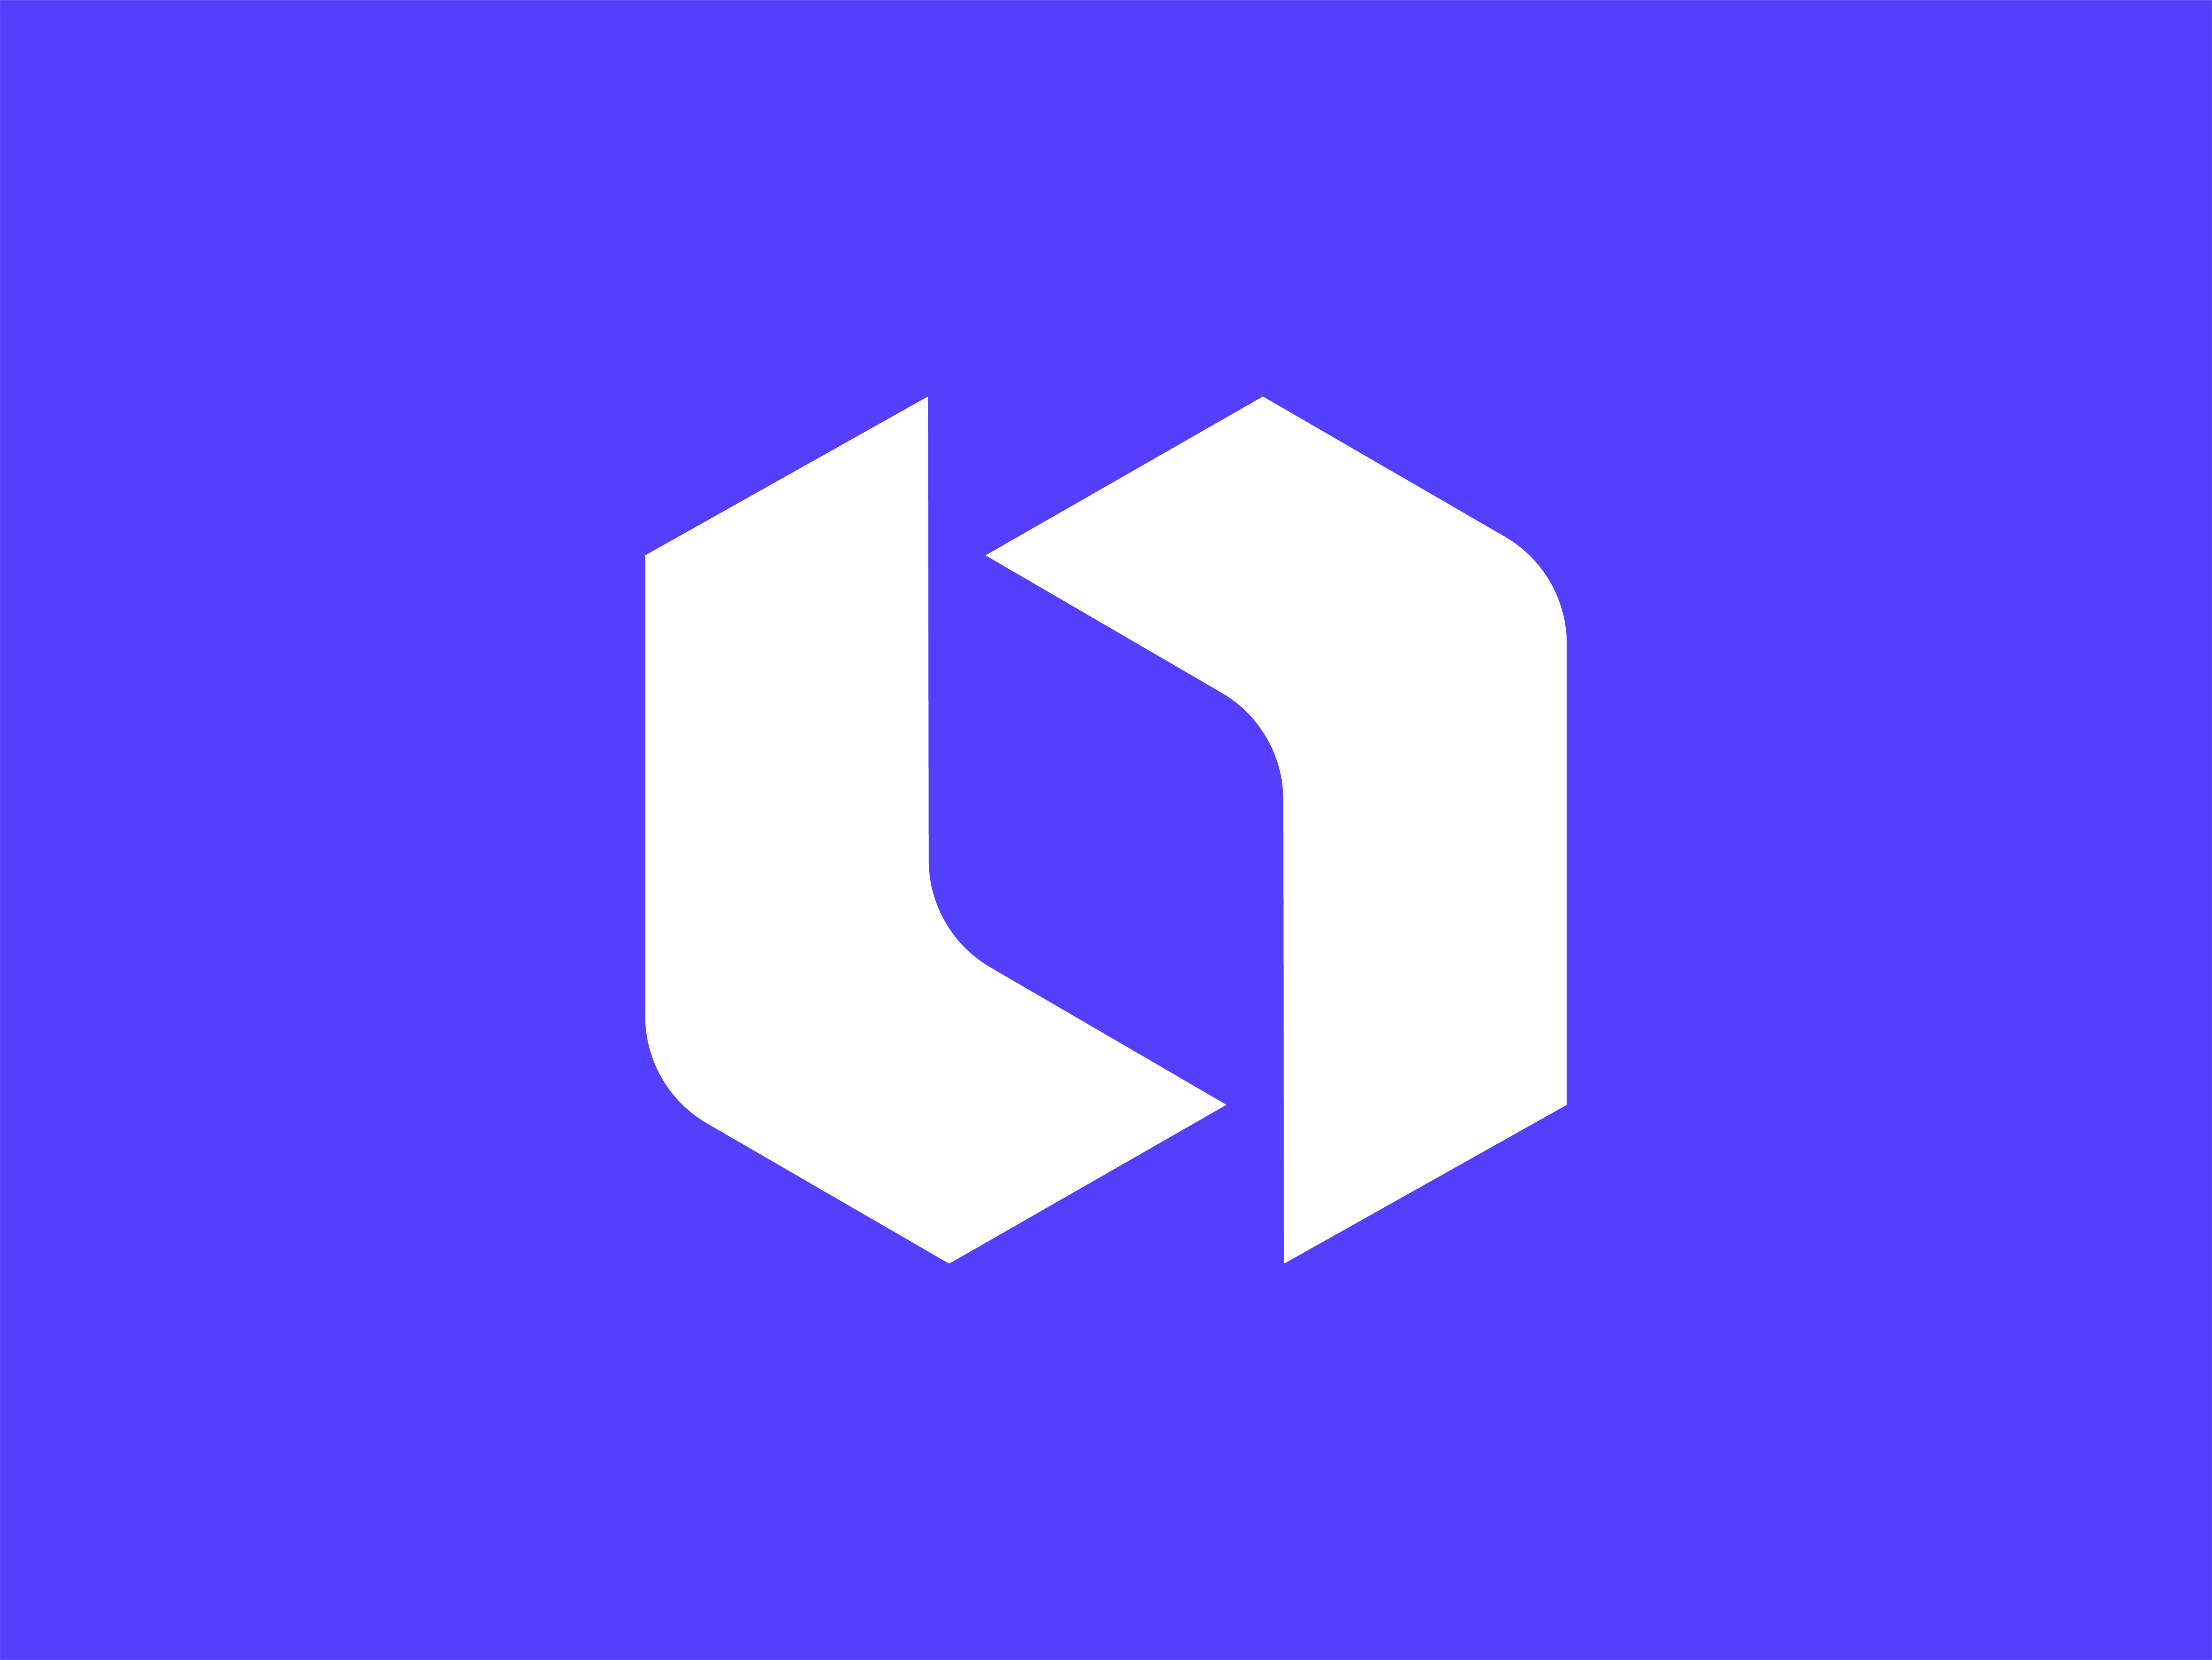 Symbol blue bg